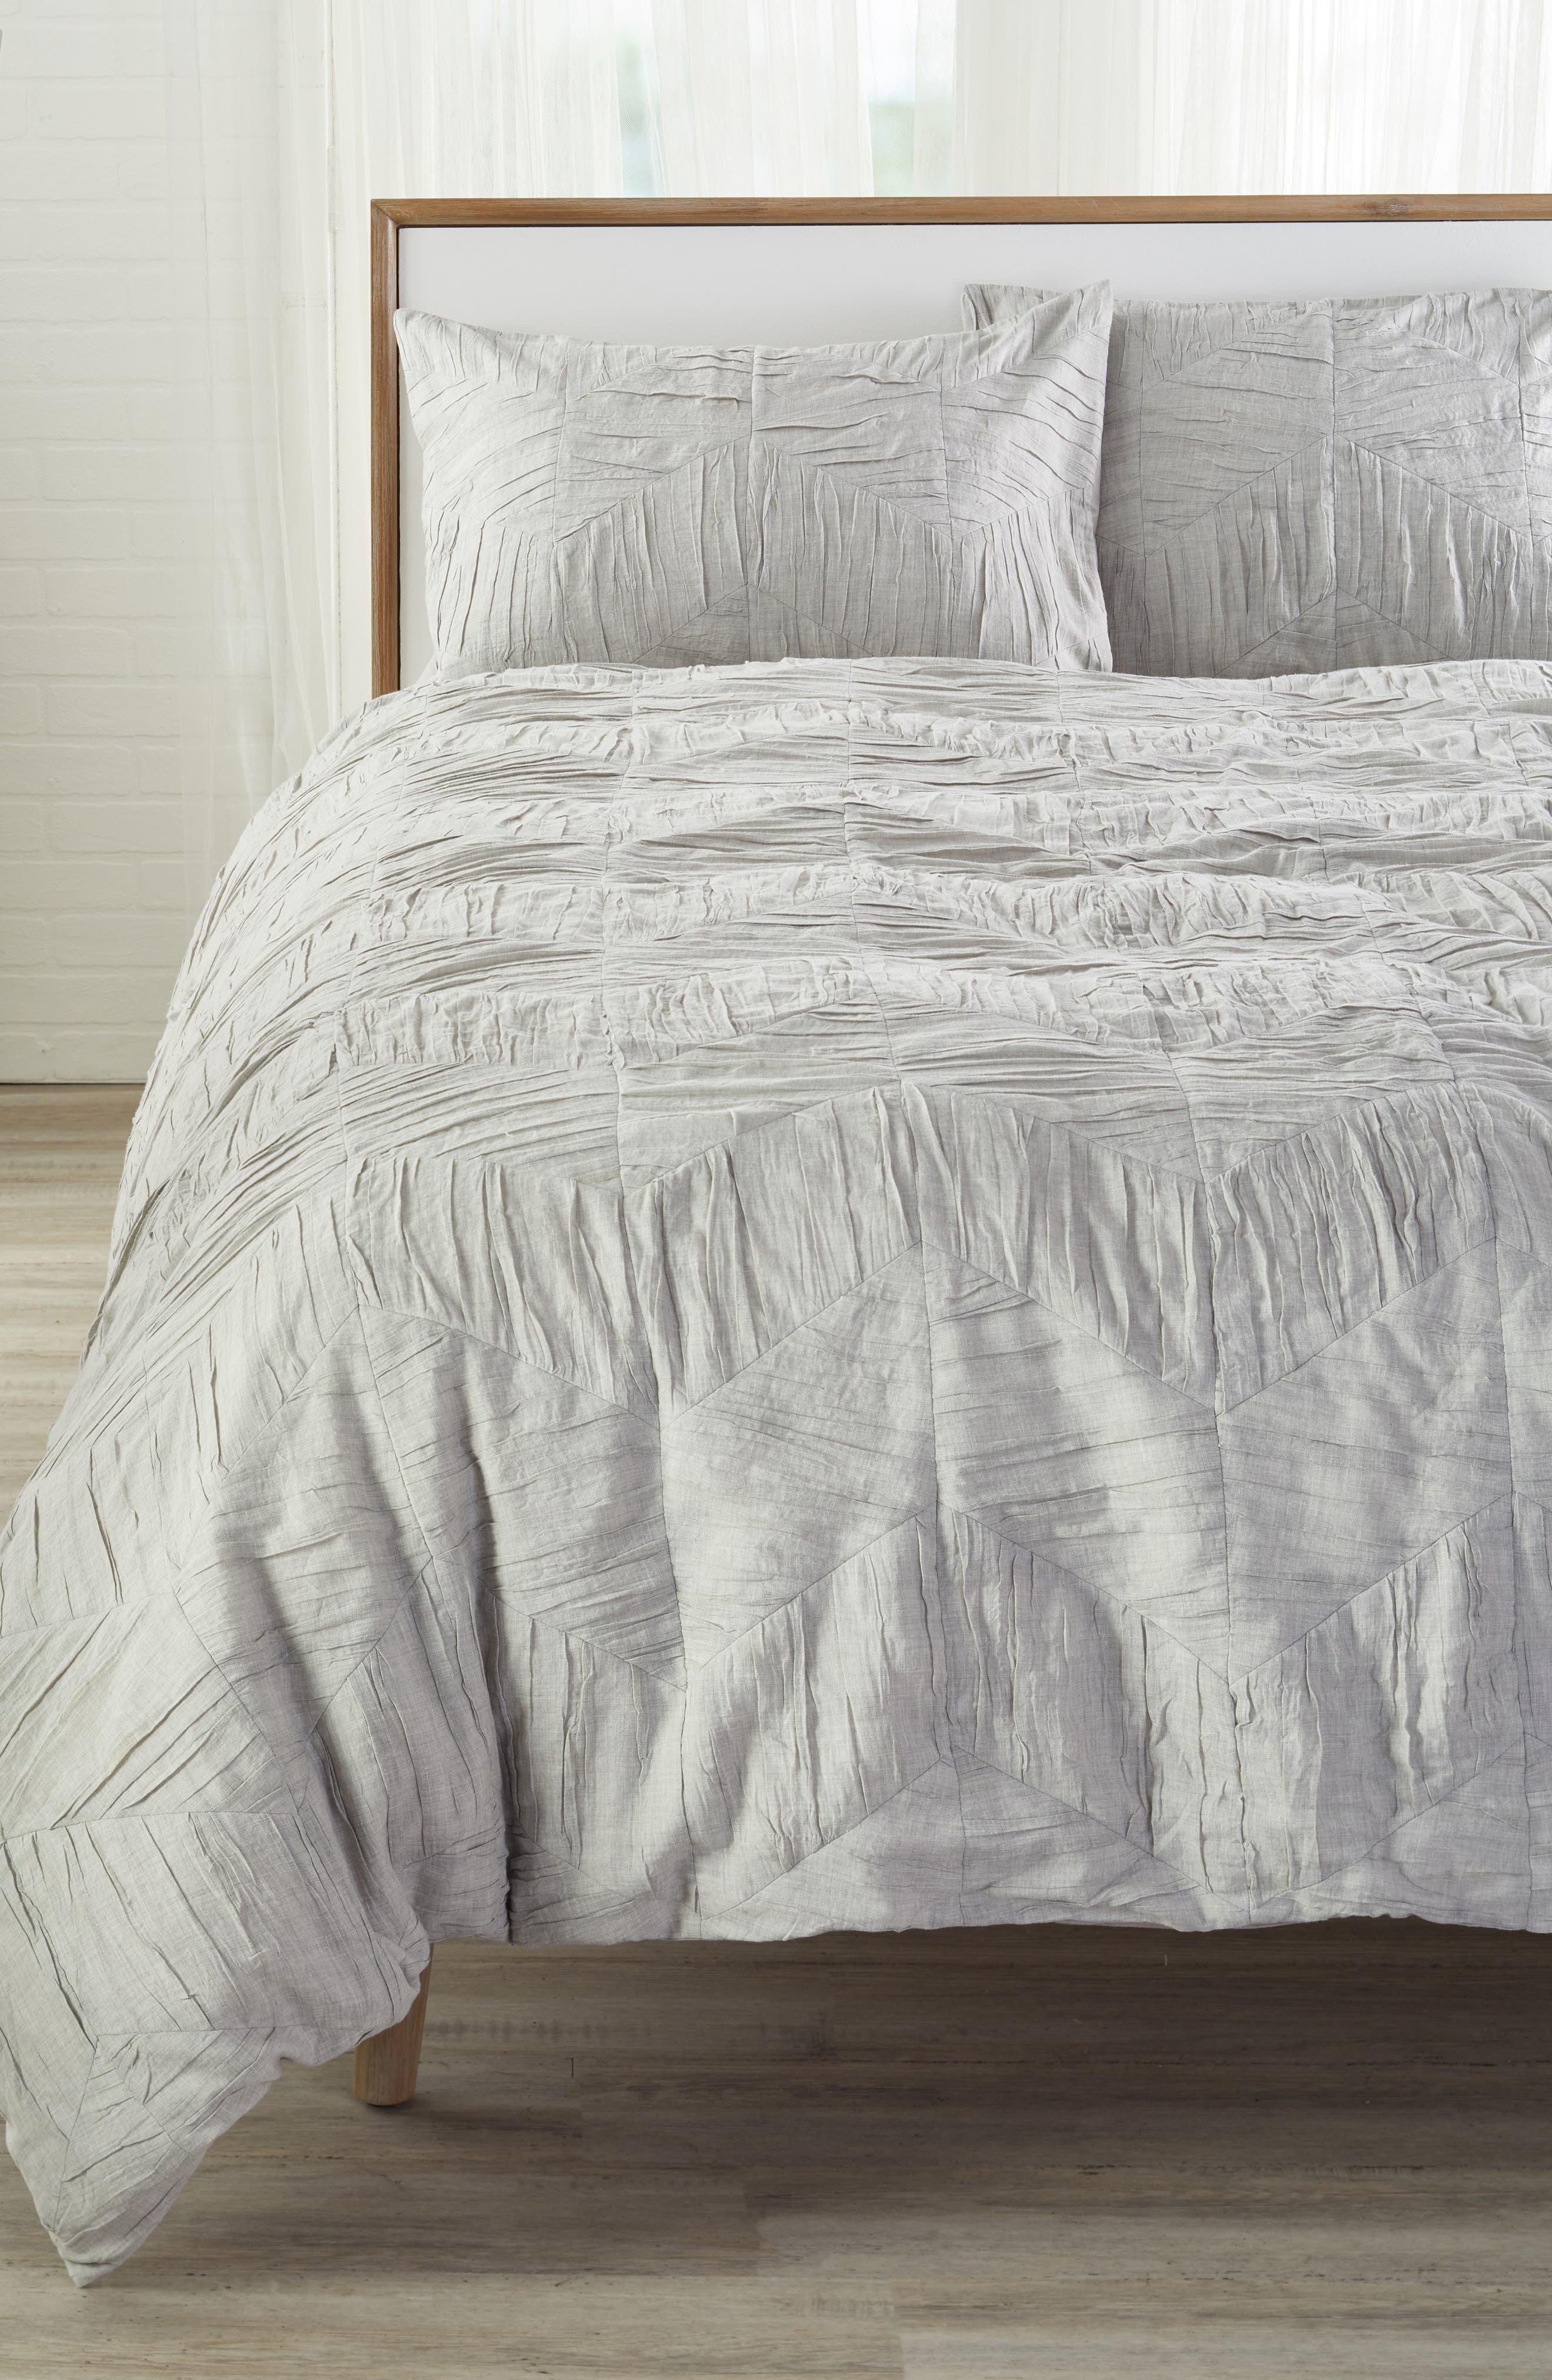 Selene Heathered Duvet Cover,                         Main,                         color, GREY OPAL HEATHER